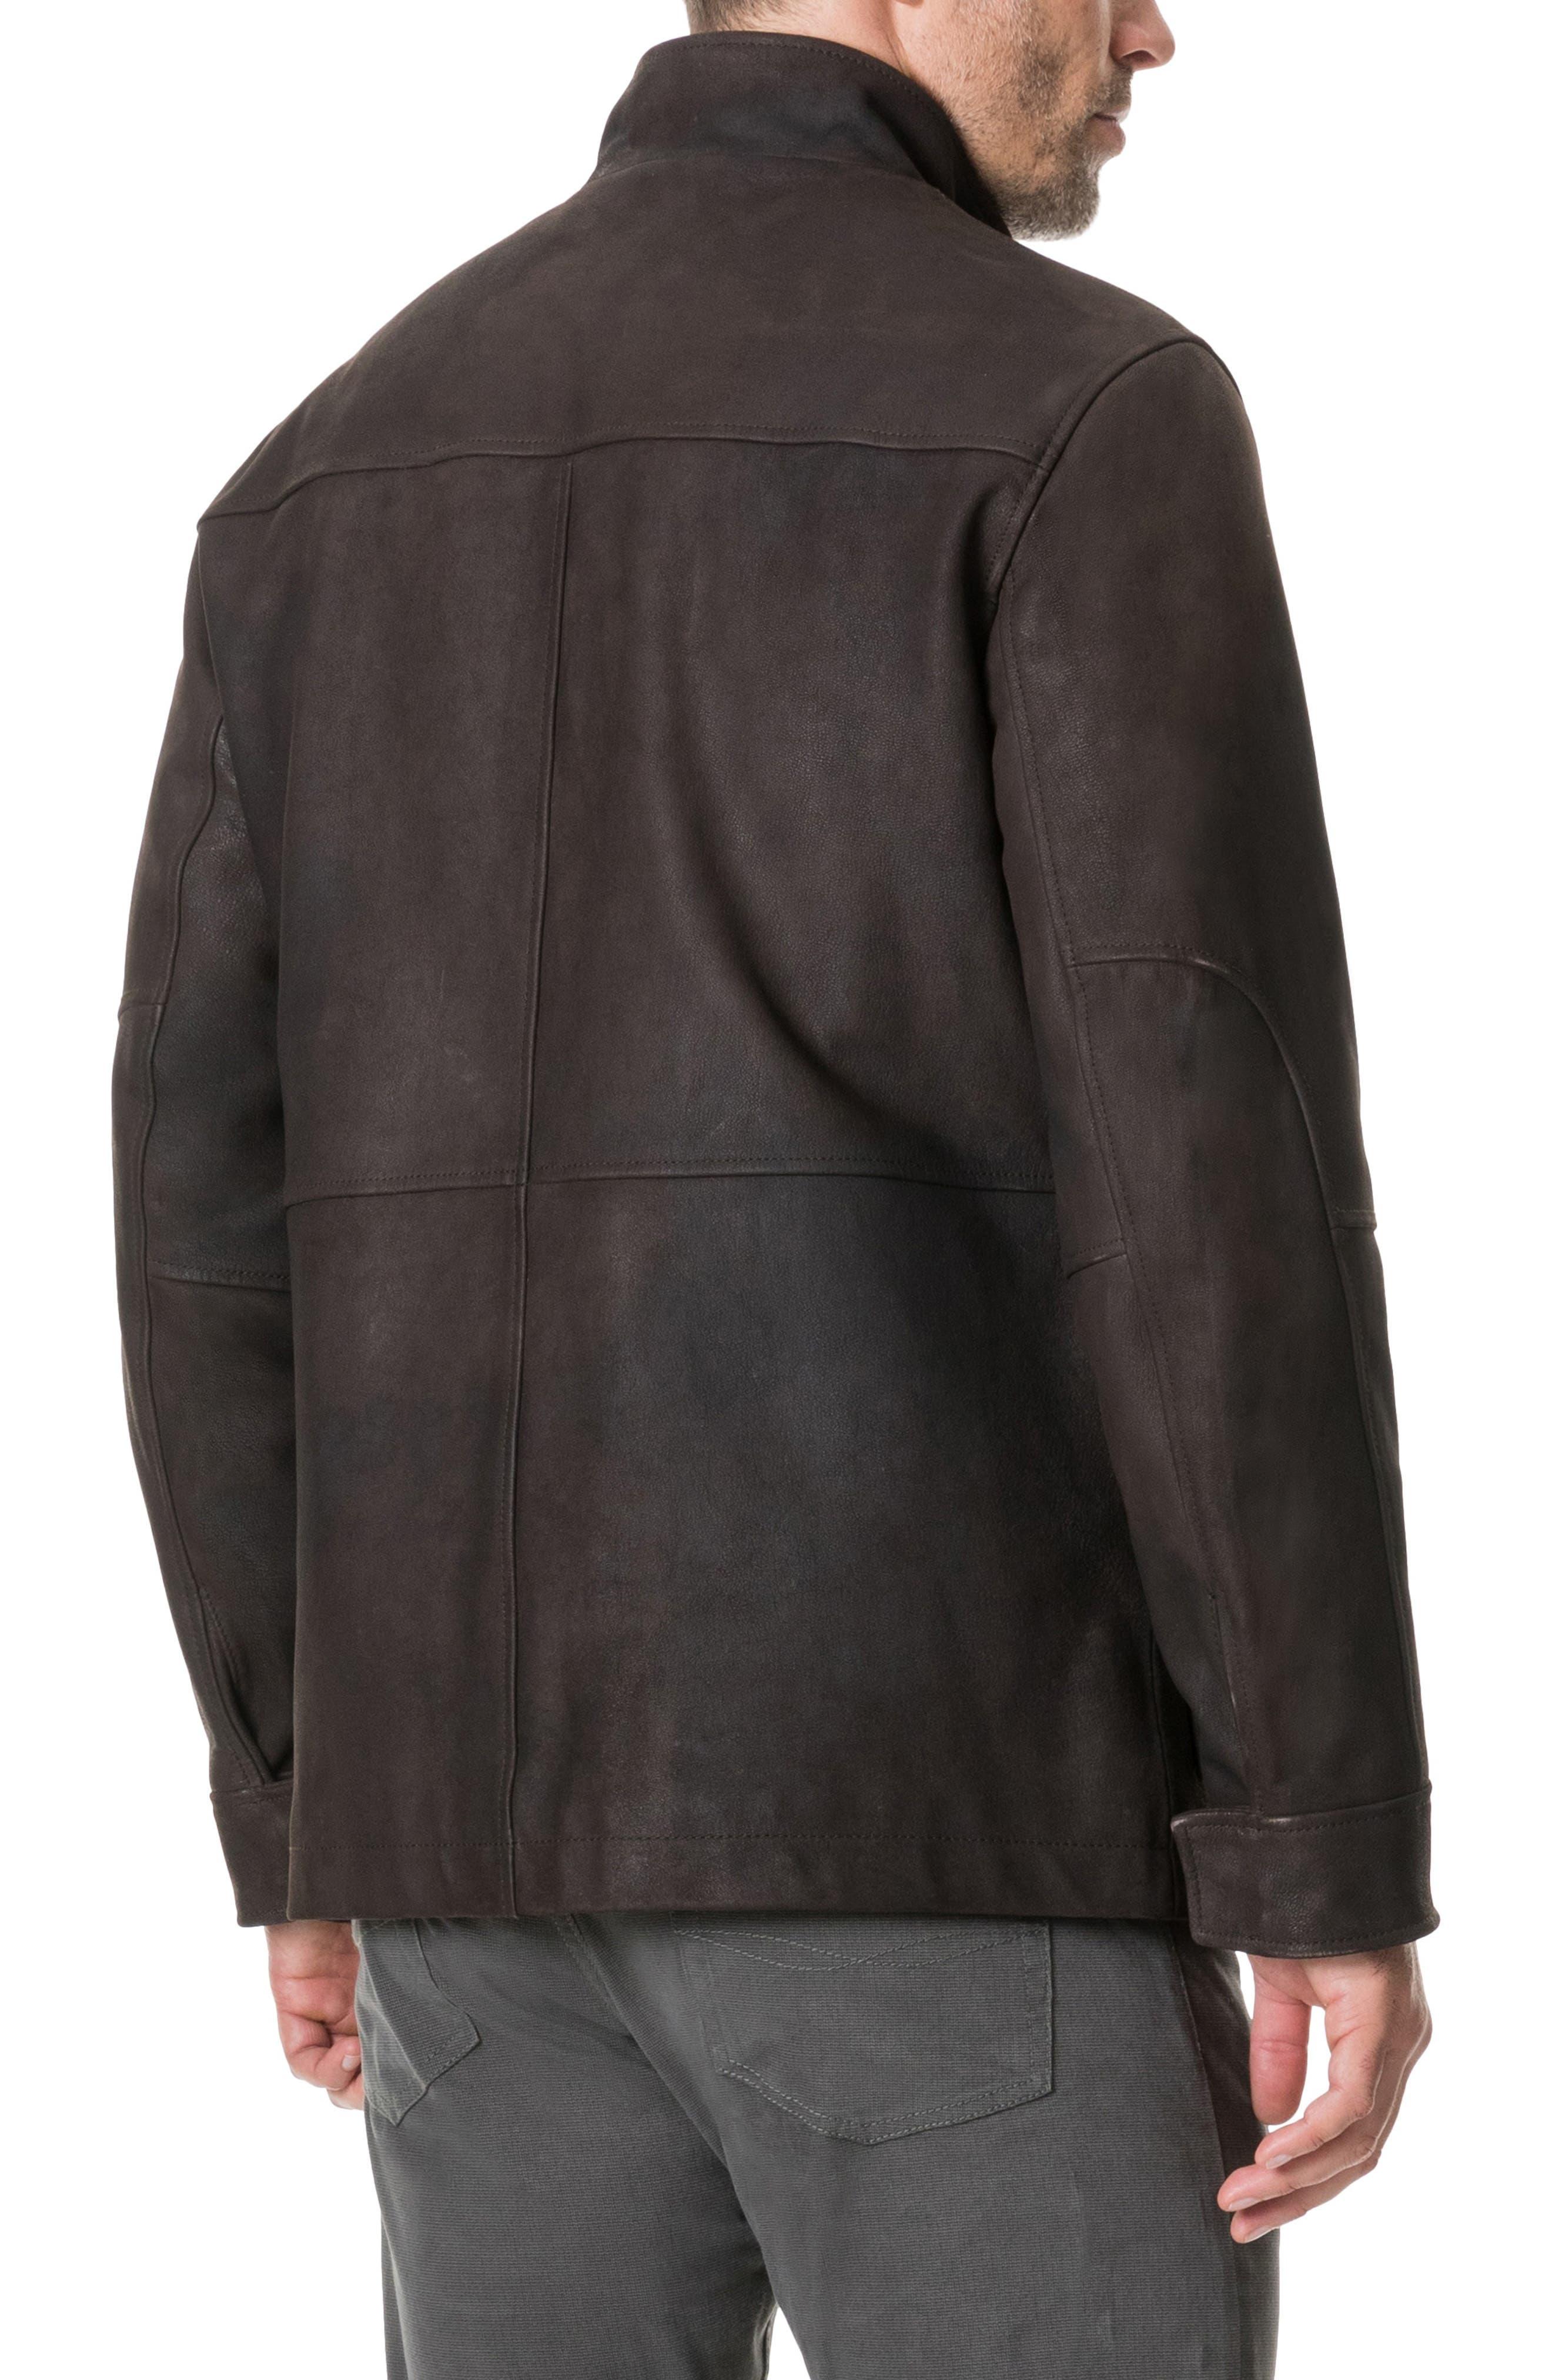 Fairholme Leather Jacket,                             Alternate thumbnail 2, color,                             CHOCOLATE